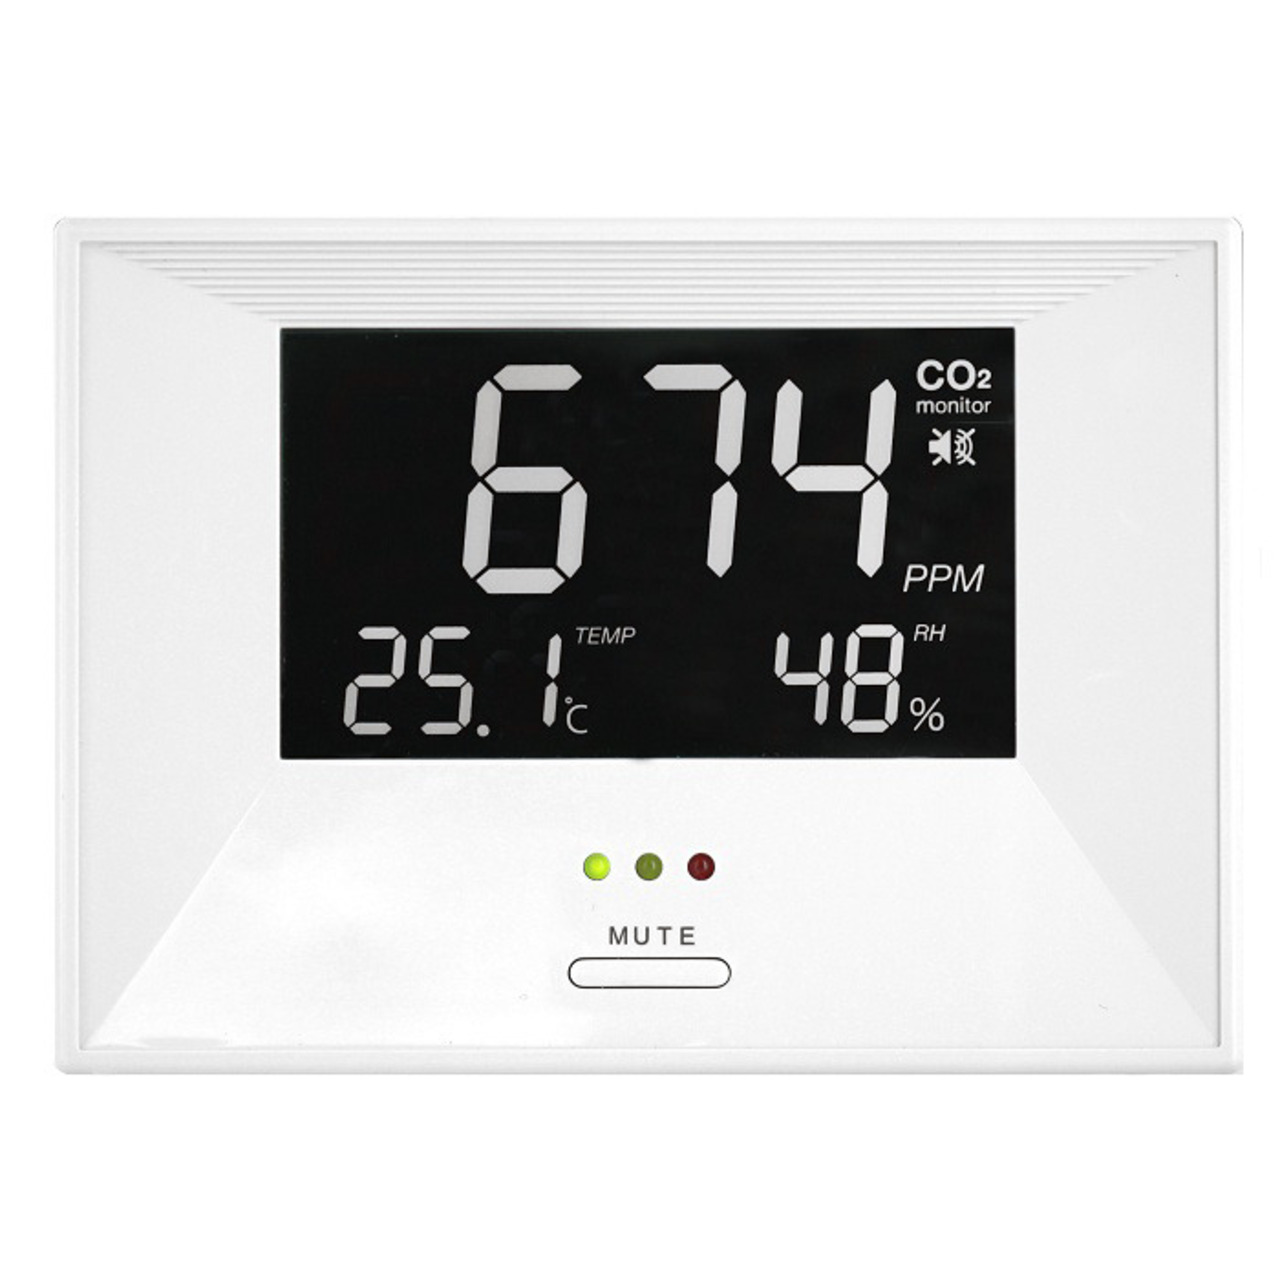 TFA CO2-Messgerund-228 t undquot Air CO2ntrol Lifeundquot  mit Thermo-Hygrometer